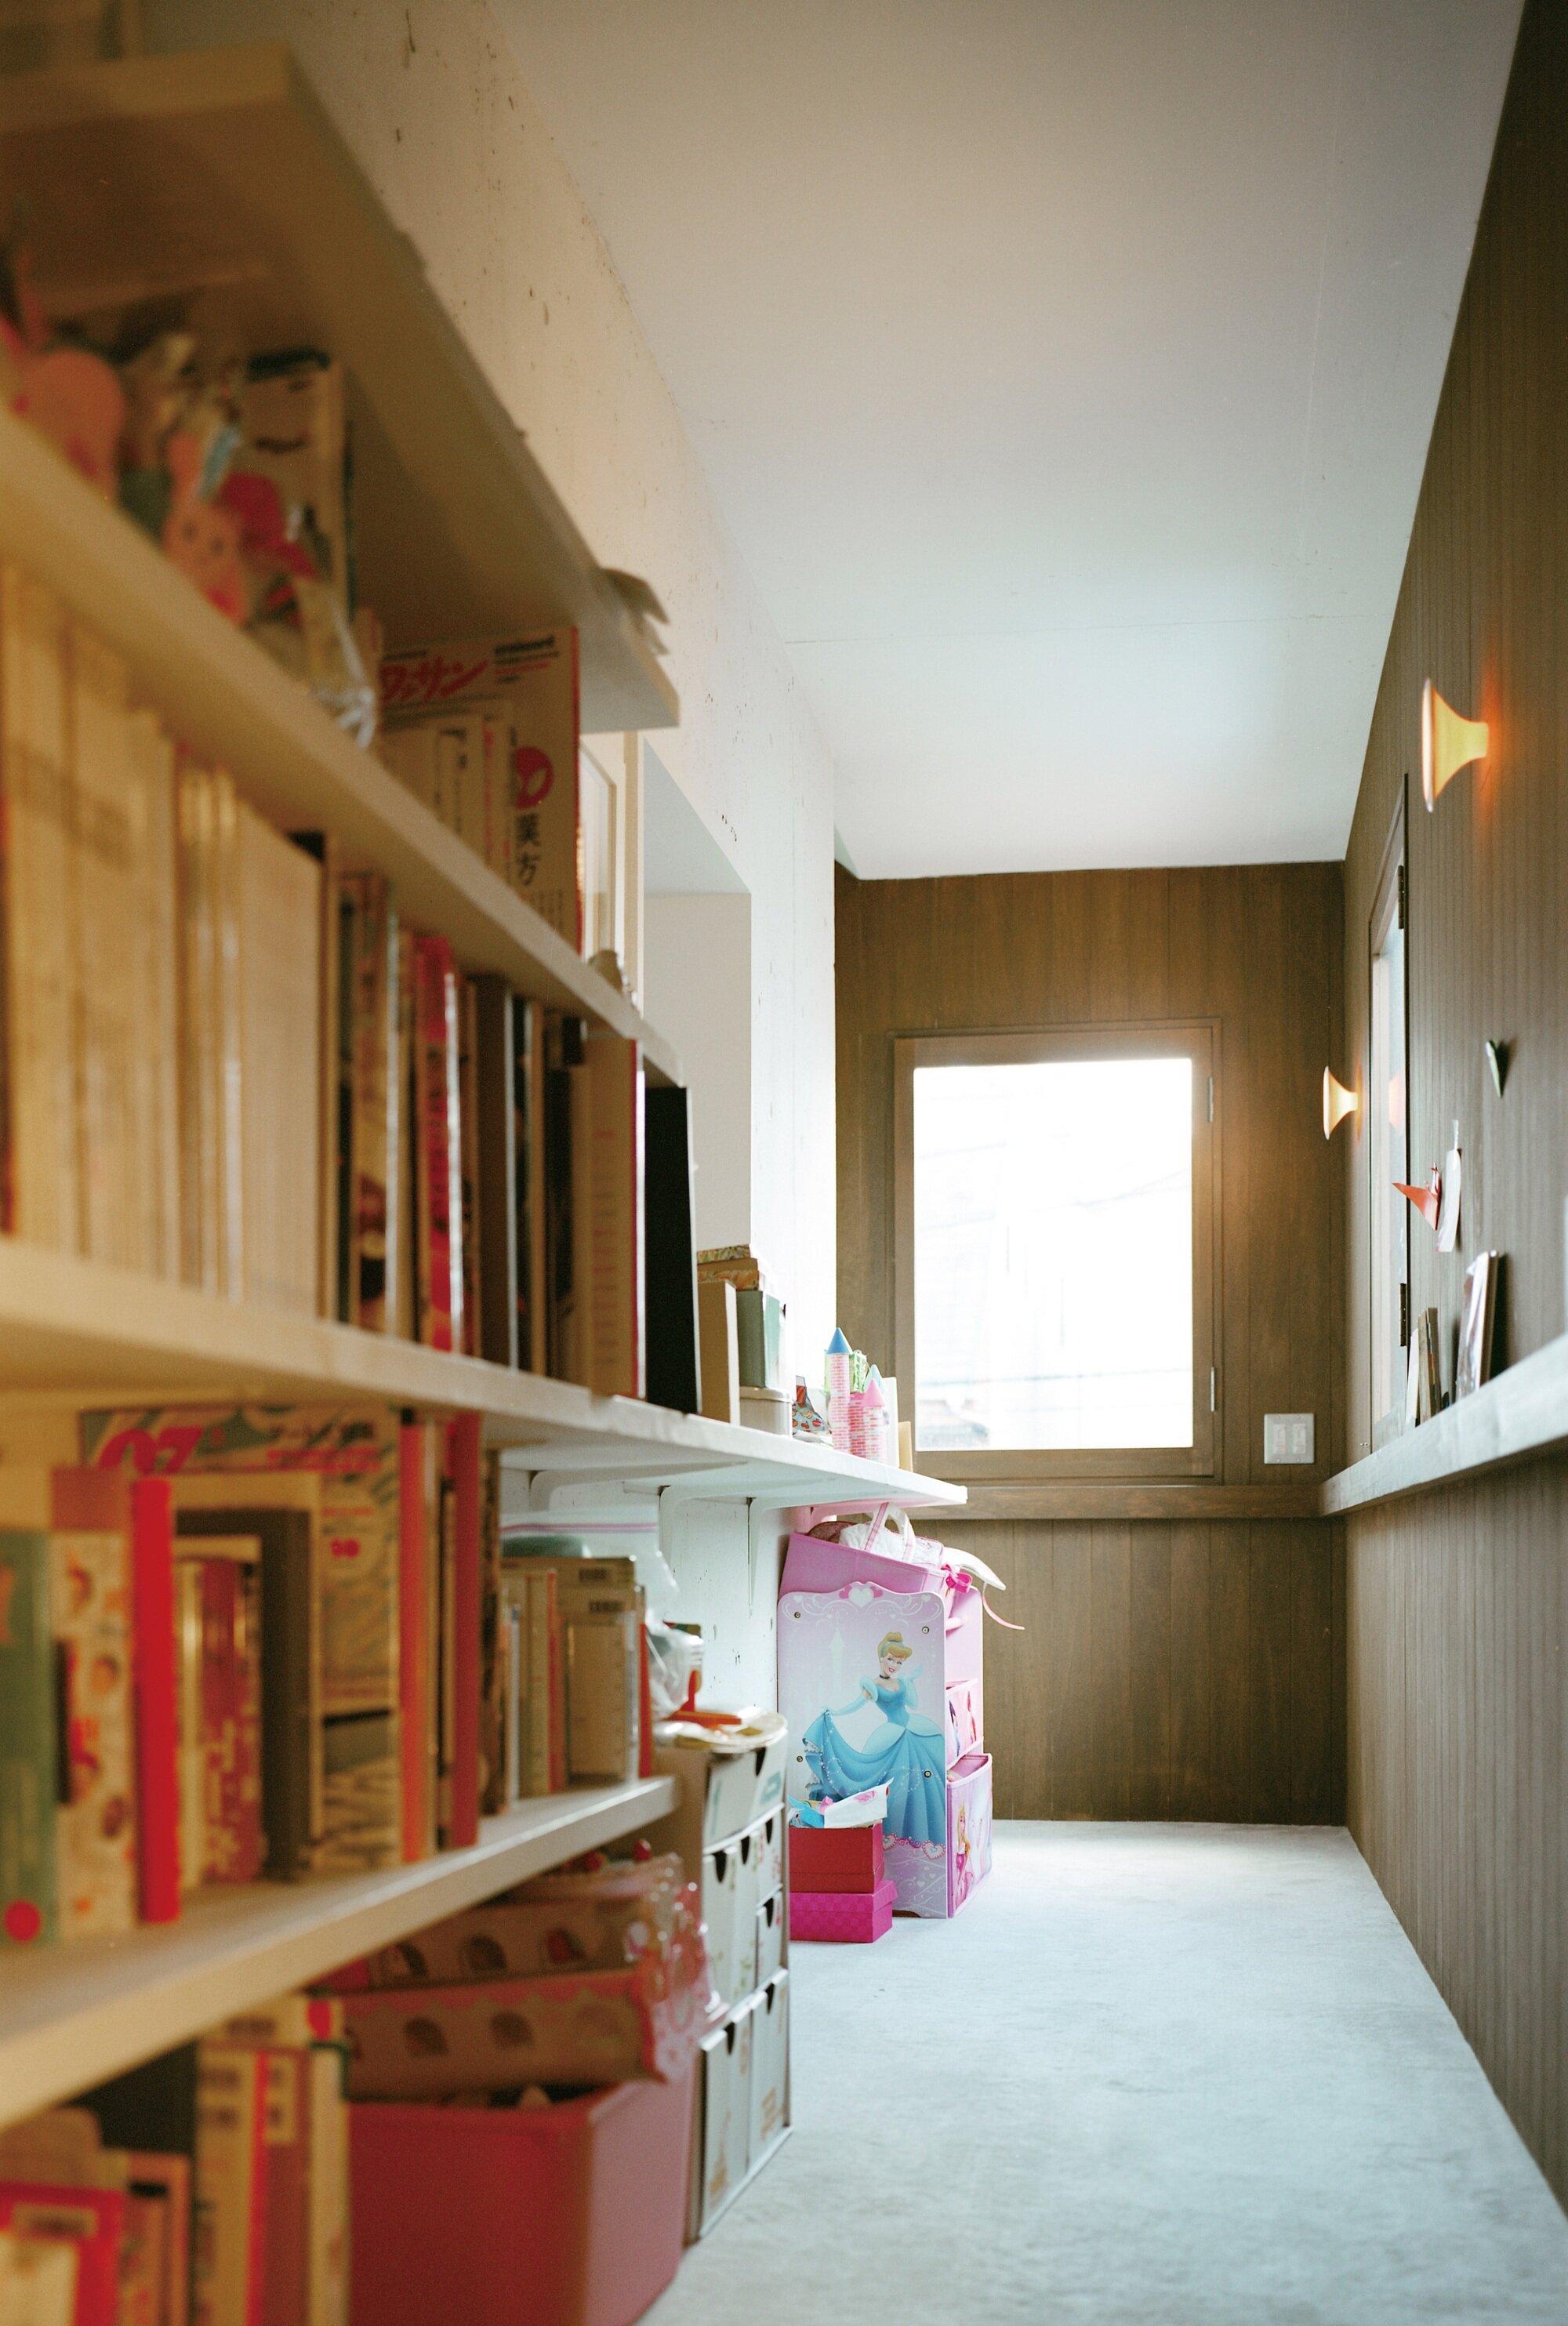 Double Helix House - Onishimaki + Hyakudayuki Architects - Tokyo - Shelving Books - Humble Homes